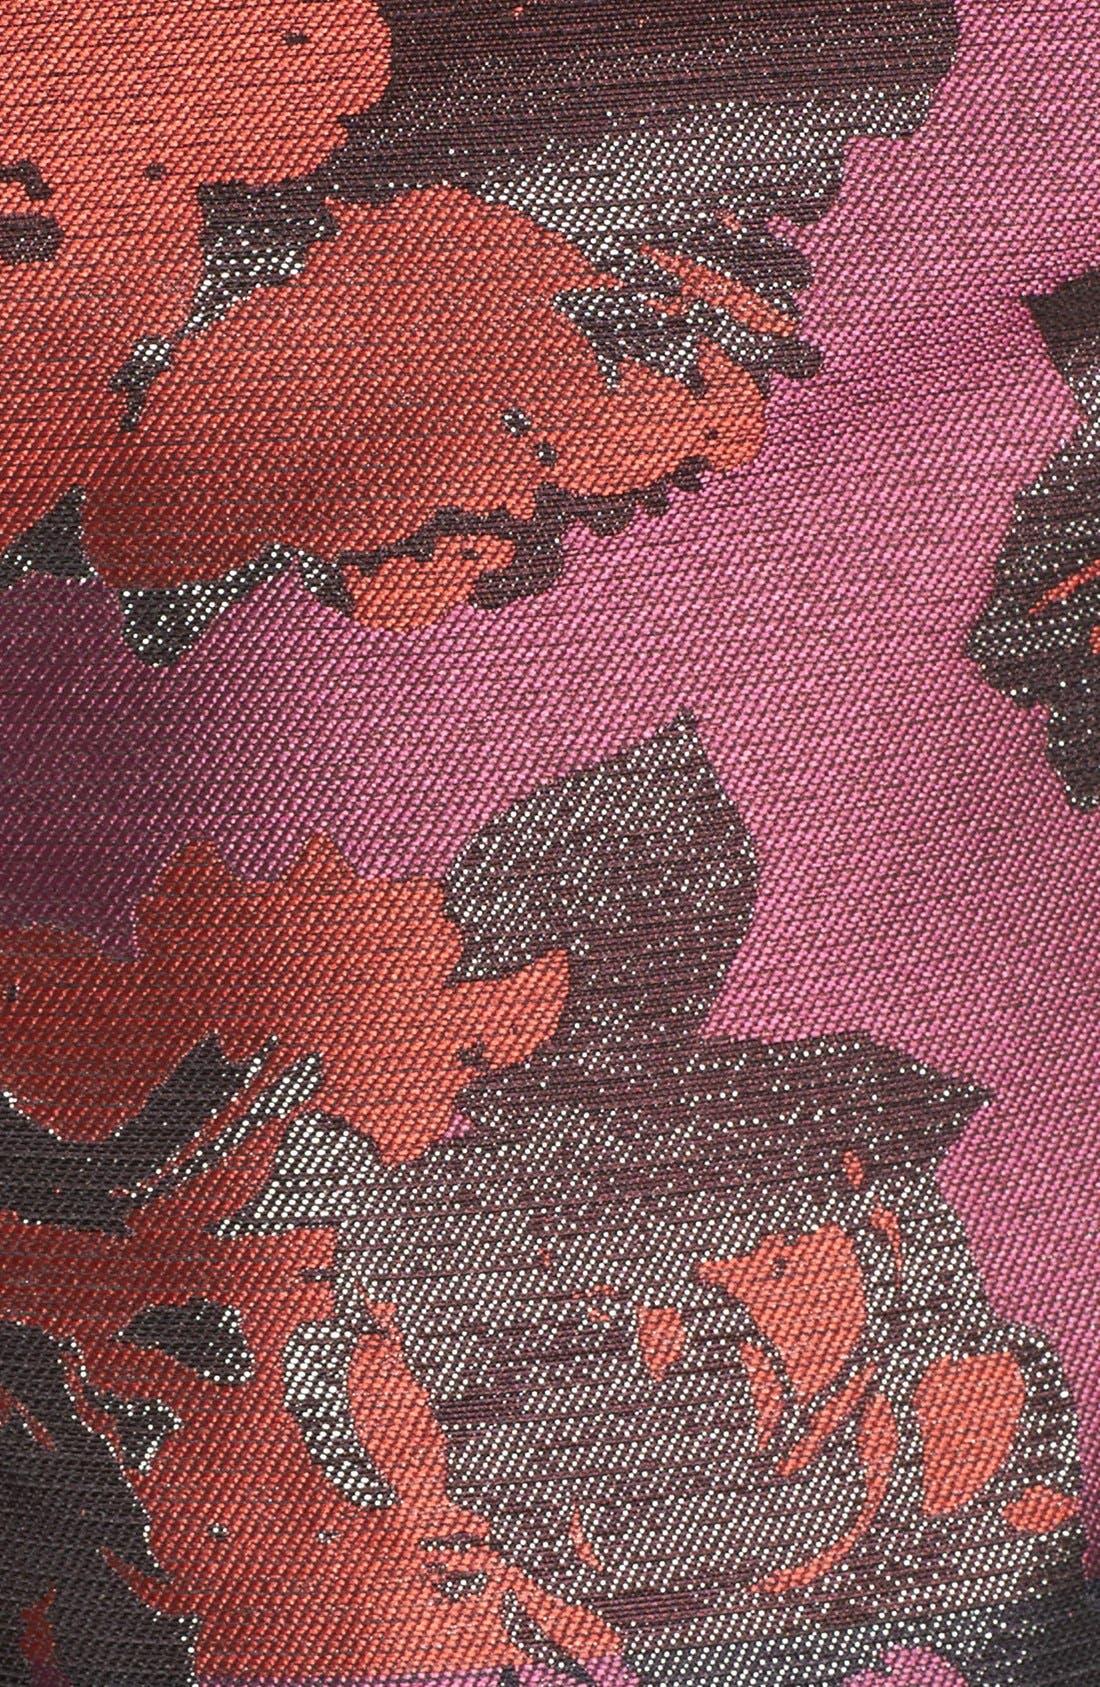 Alternate Image 5  - Vince Camuto Jacquard Fit & Flare Dress (Regular & Petite)